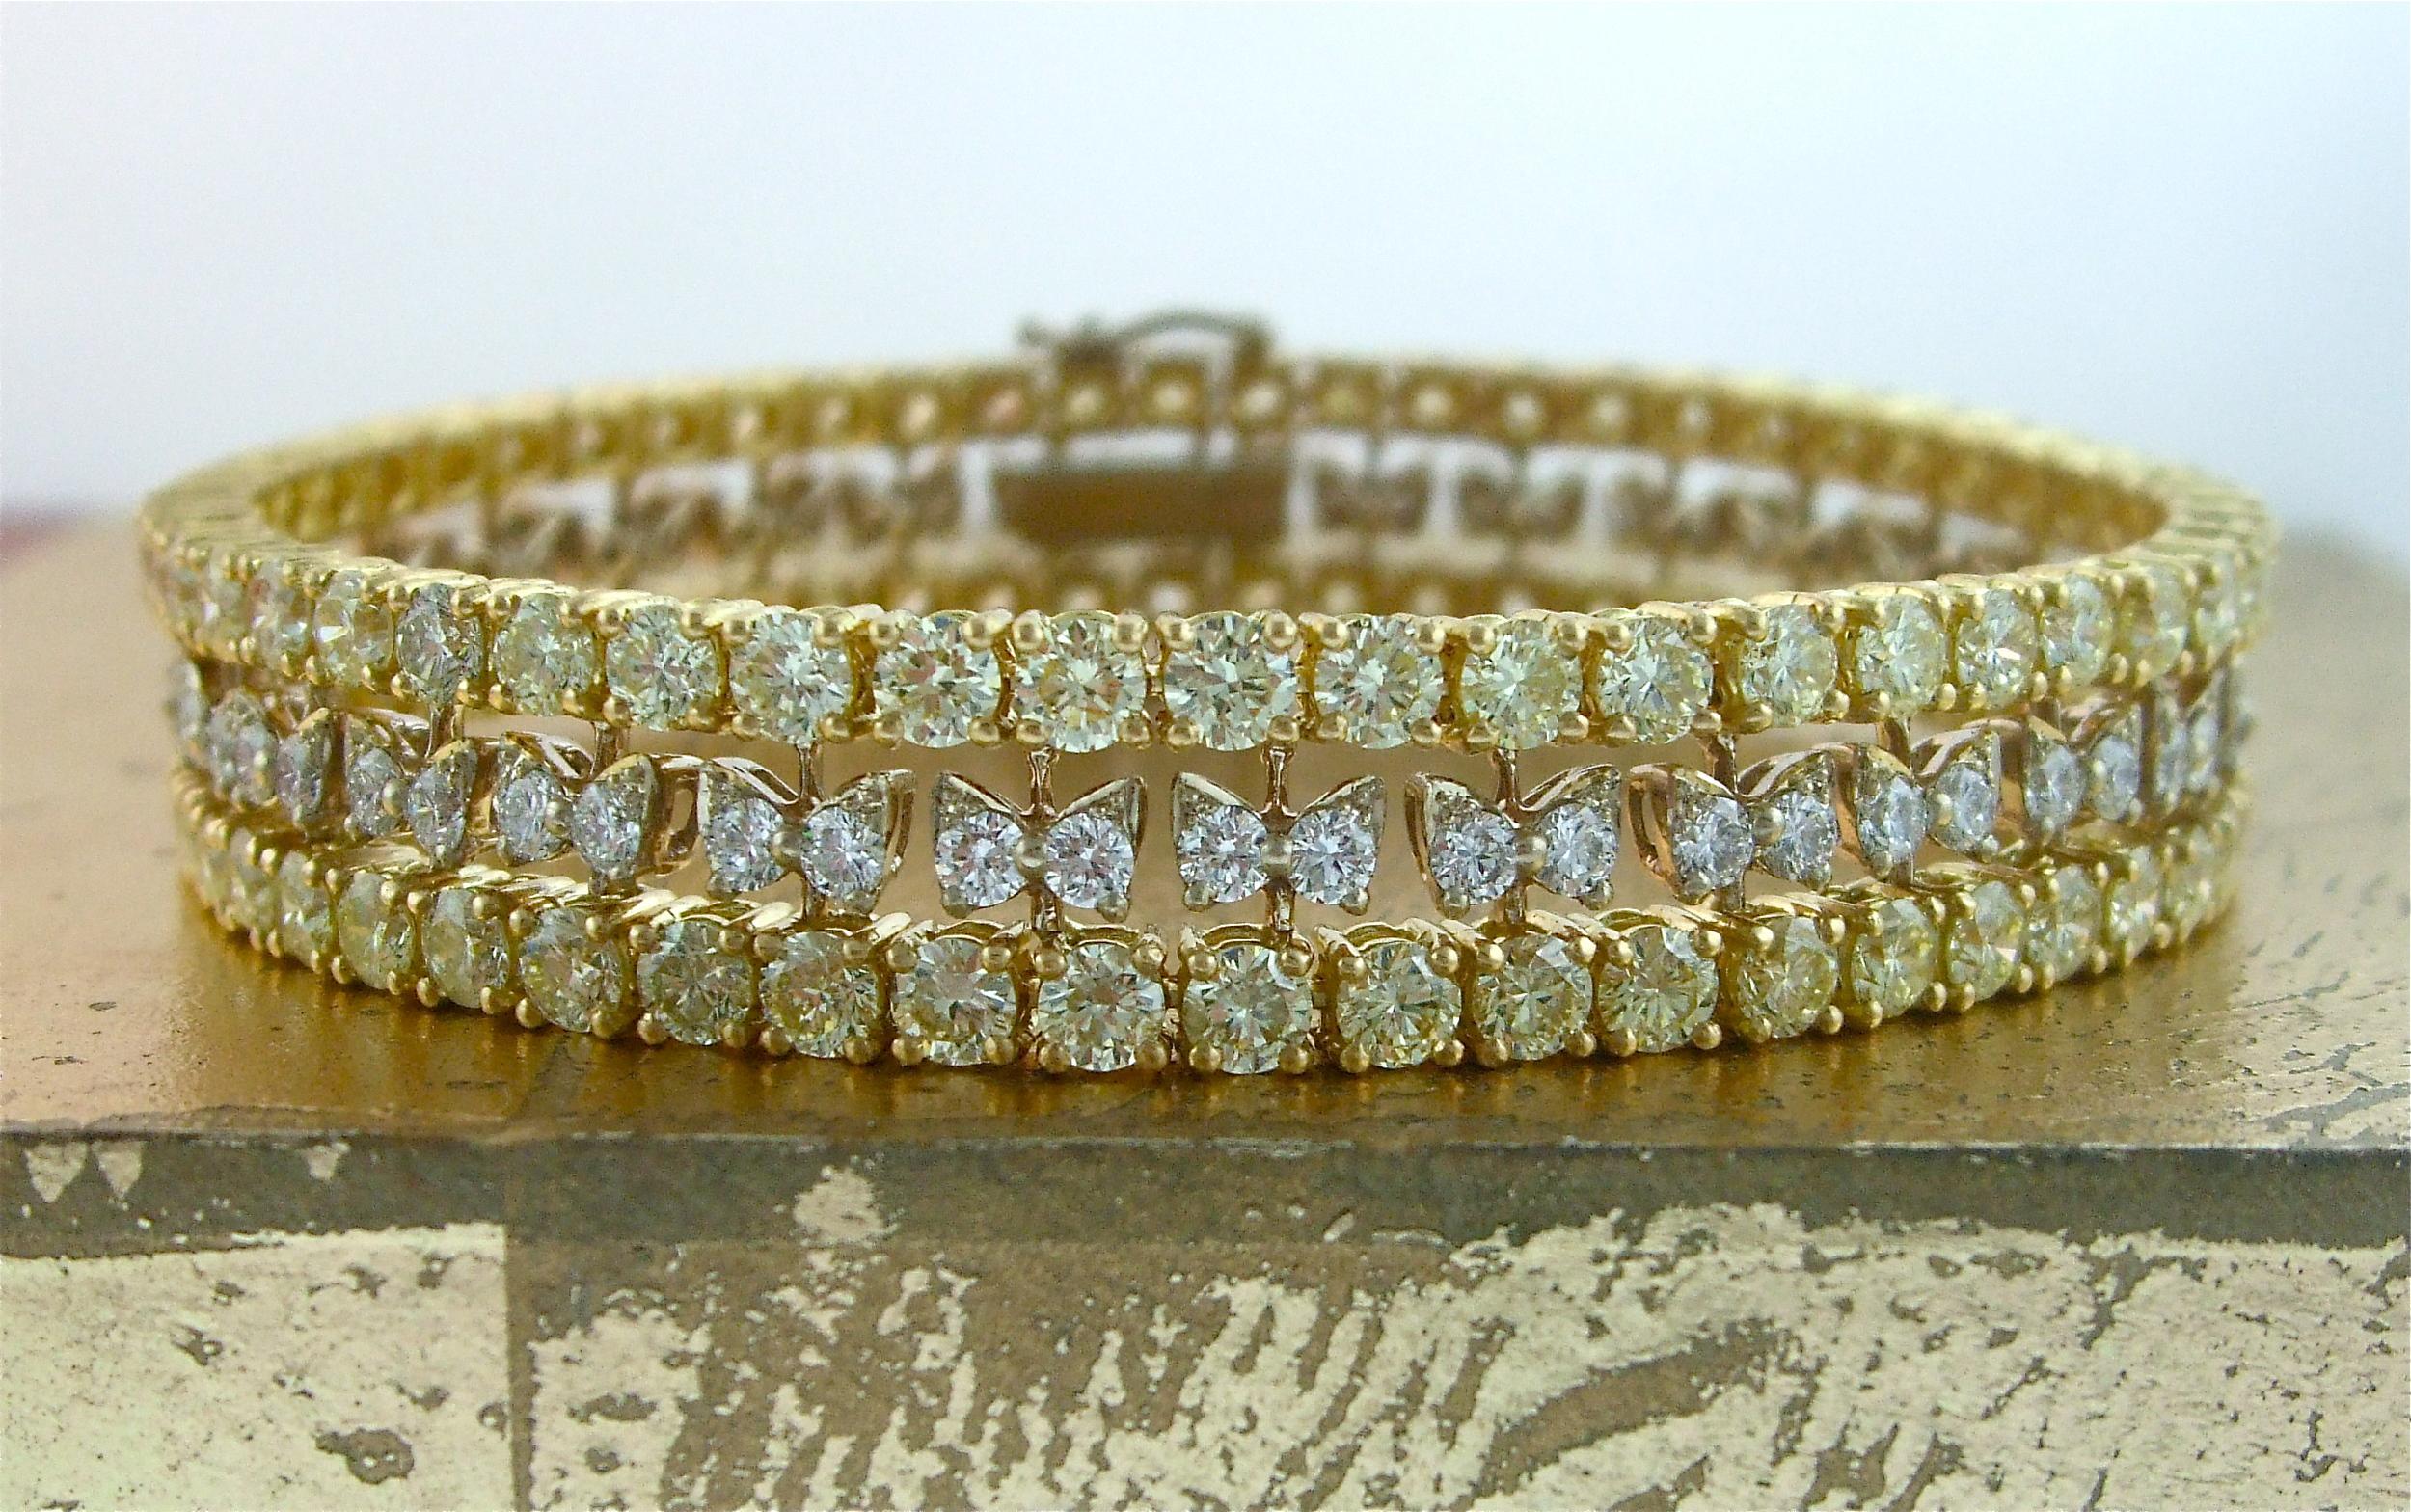 Bracelet Yellow & White Diamonds - Item No: 0013593